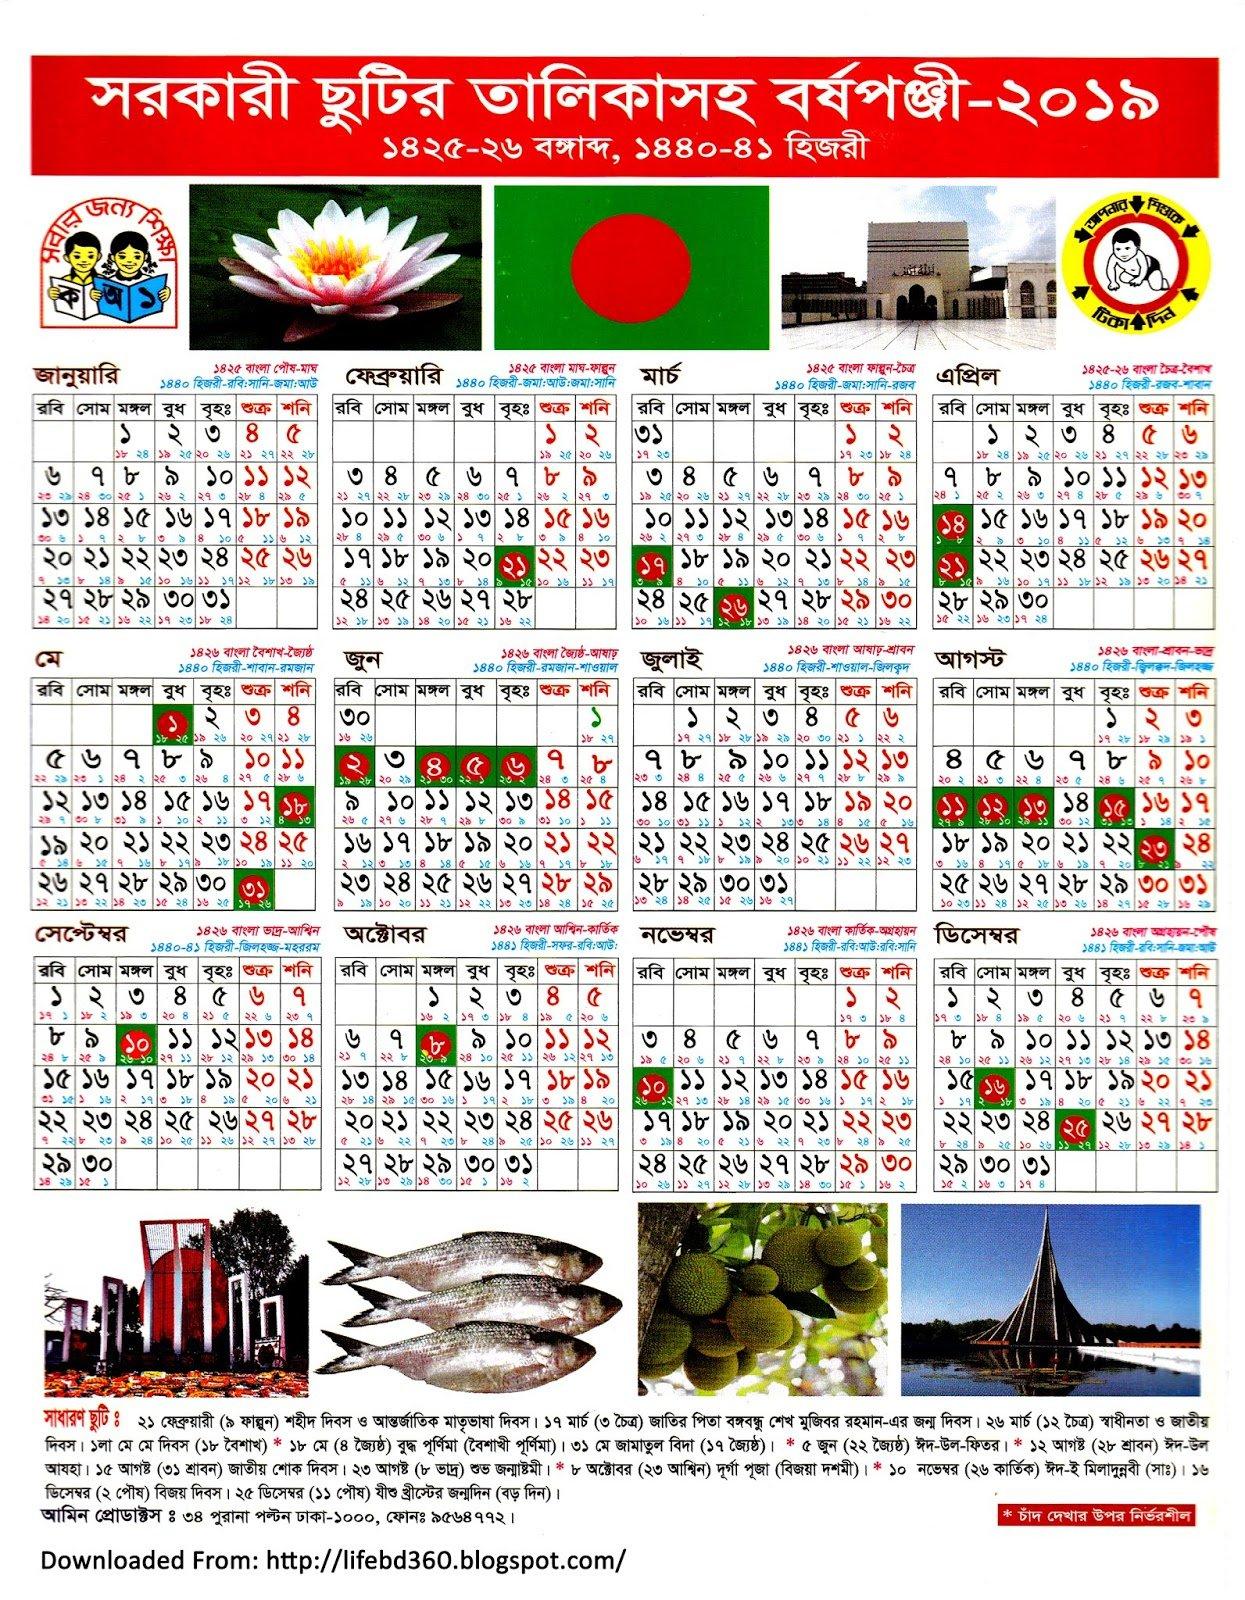 Bangladesh Government Holiday Calendar 2019 | Life In Bangladesh Calendar 2019 Government Holidays